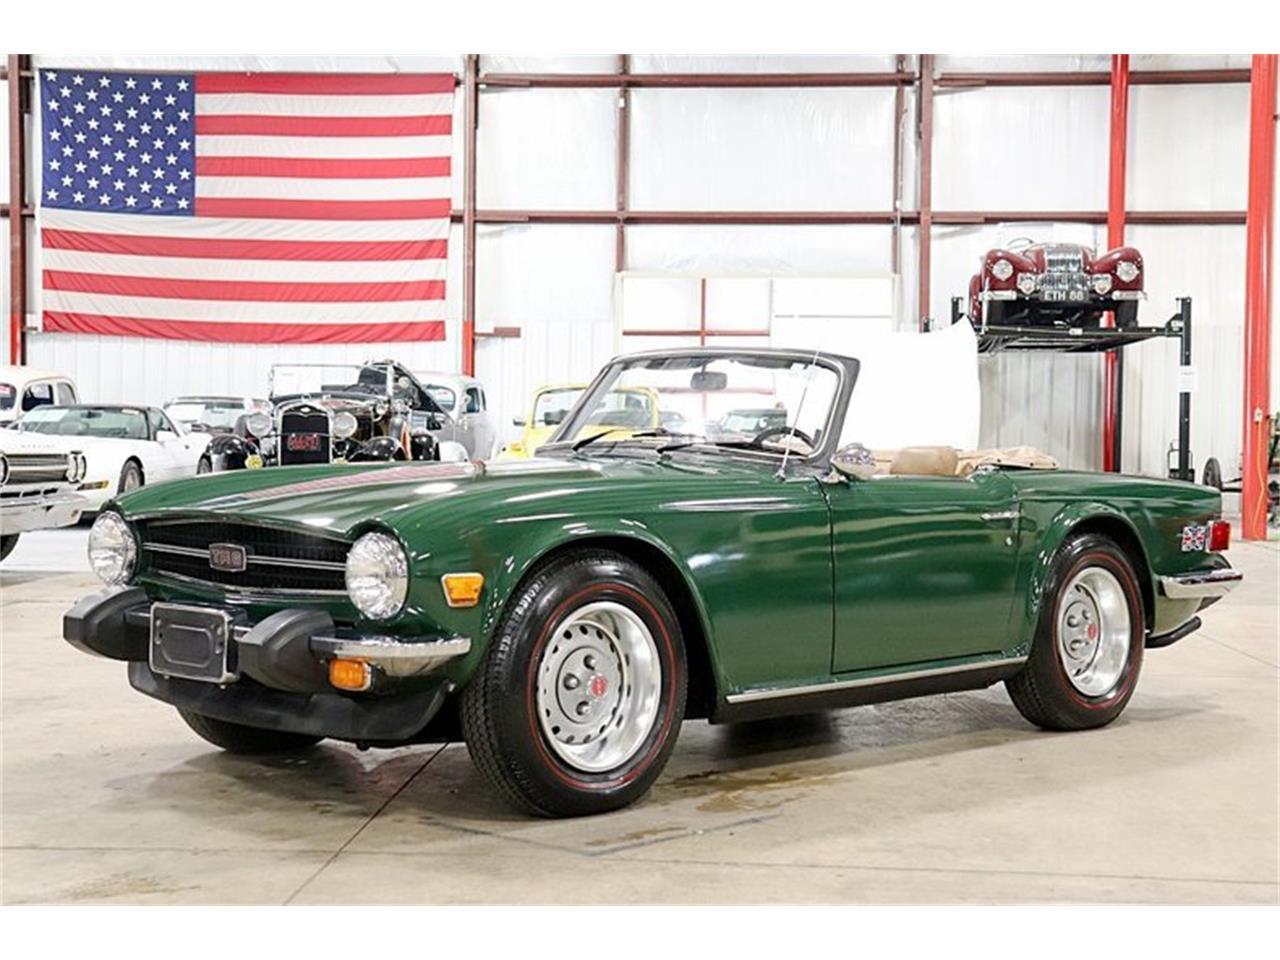 1976 Triumph Tr6 For Sale Classiccarscom Cc 1214954